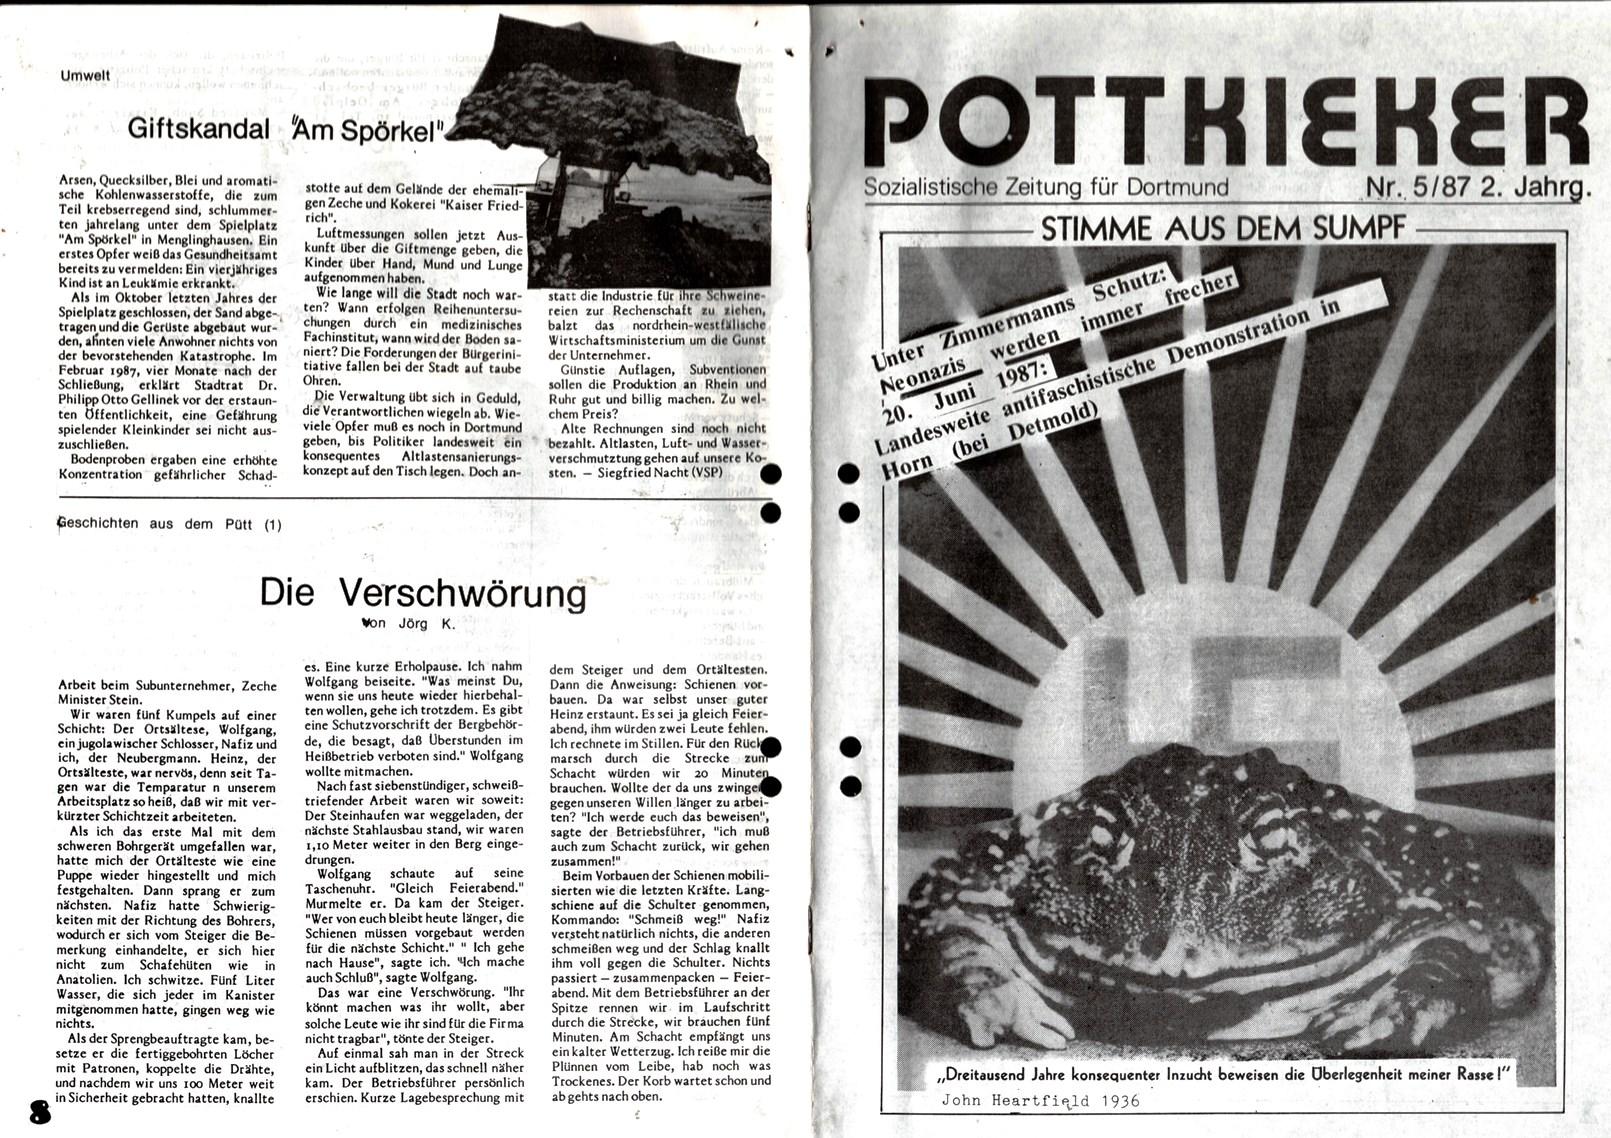 Dortmund_Pottkieker_19870600_01